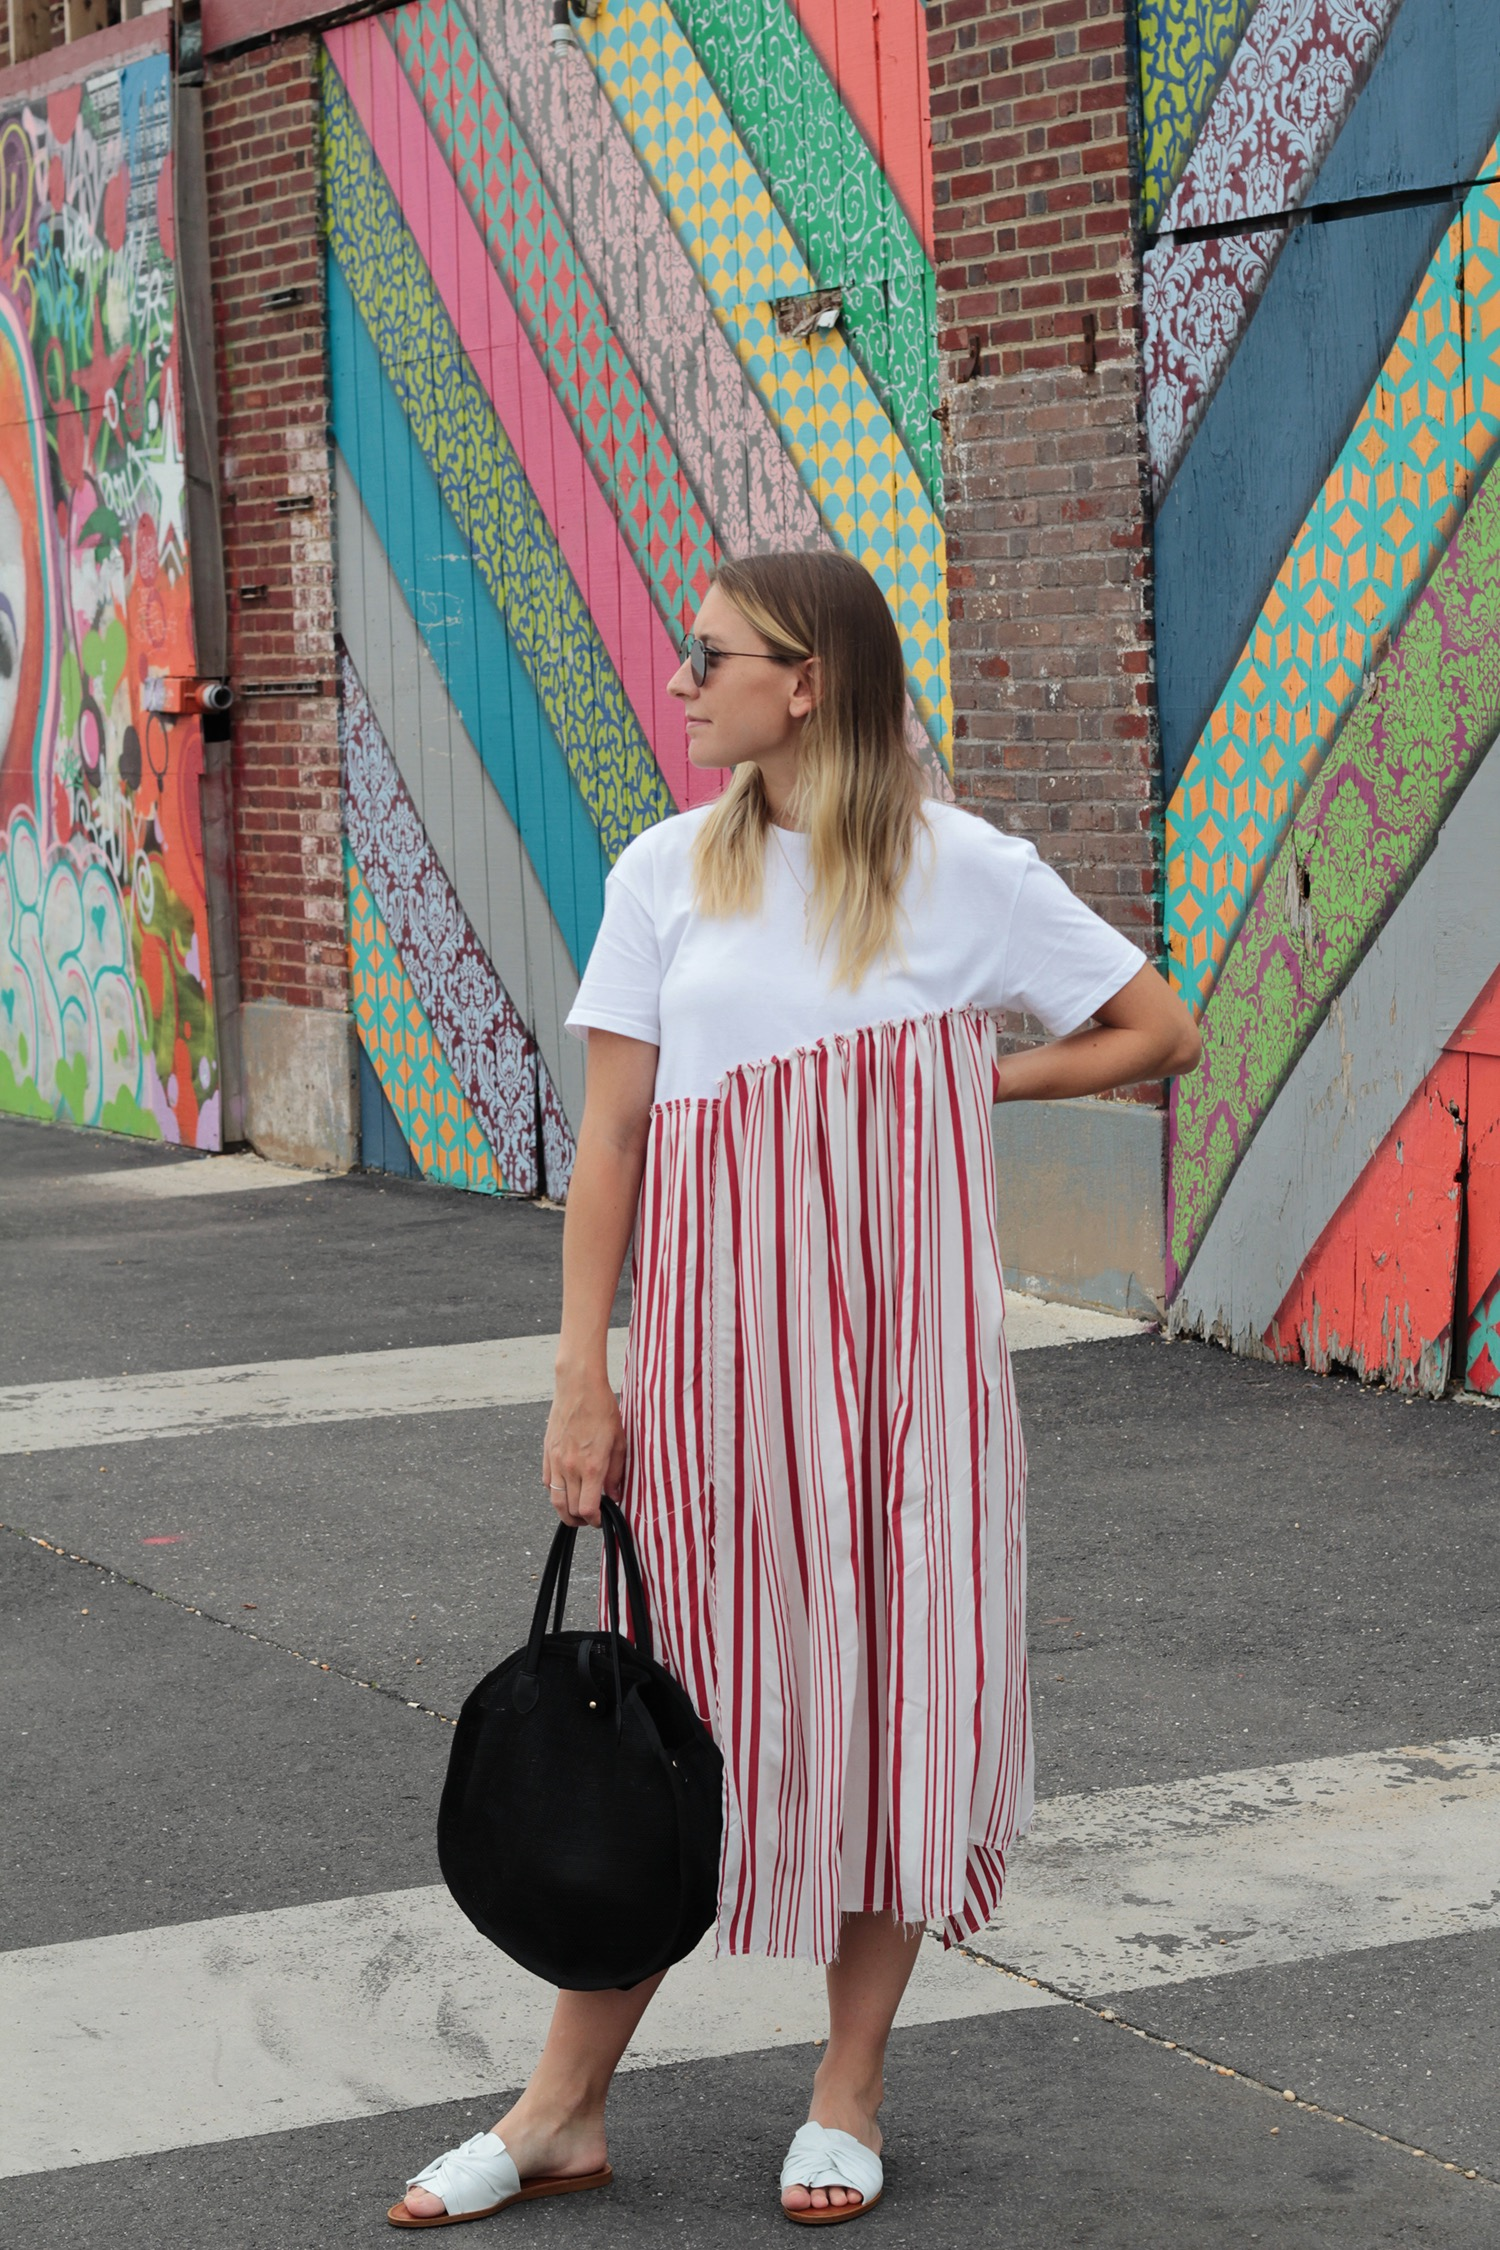 zara striped dress - Shop similar hereand here